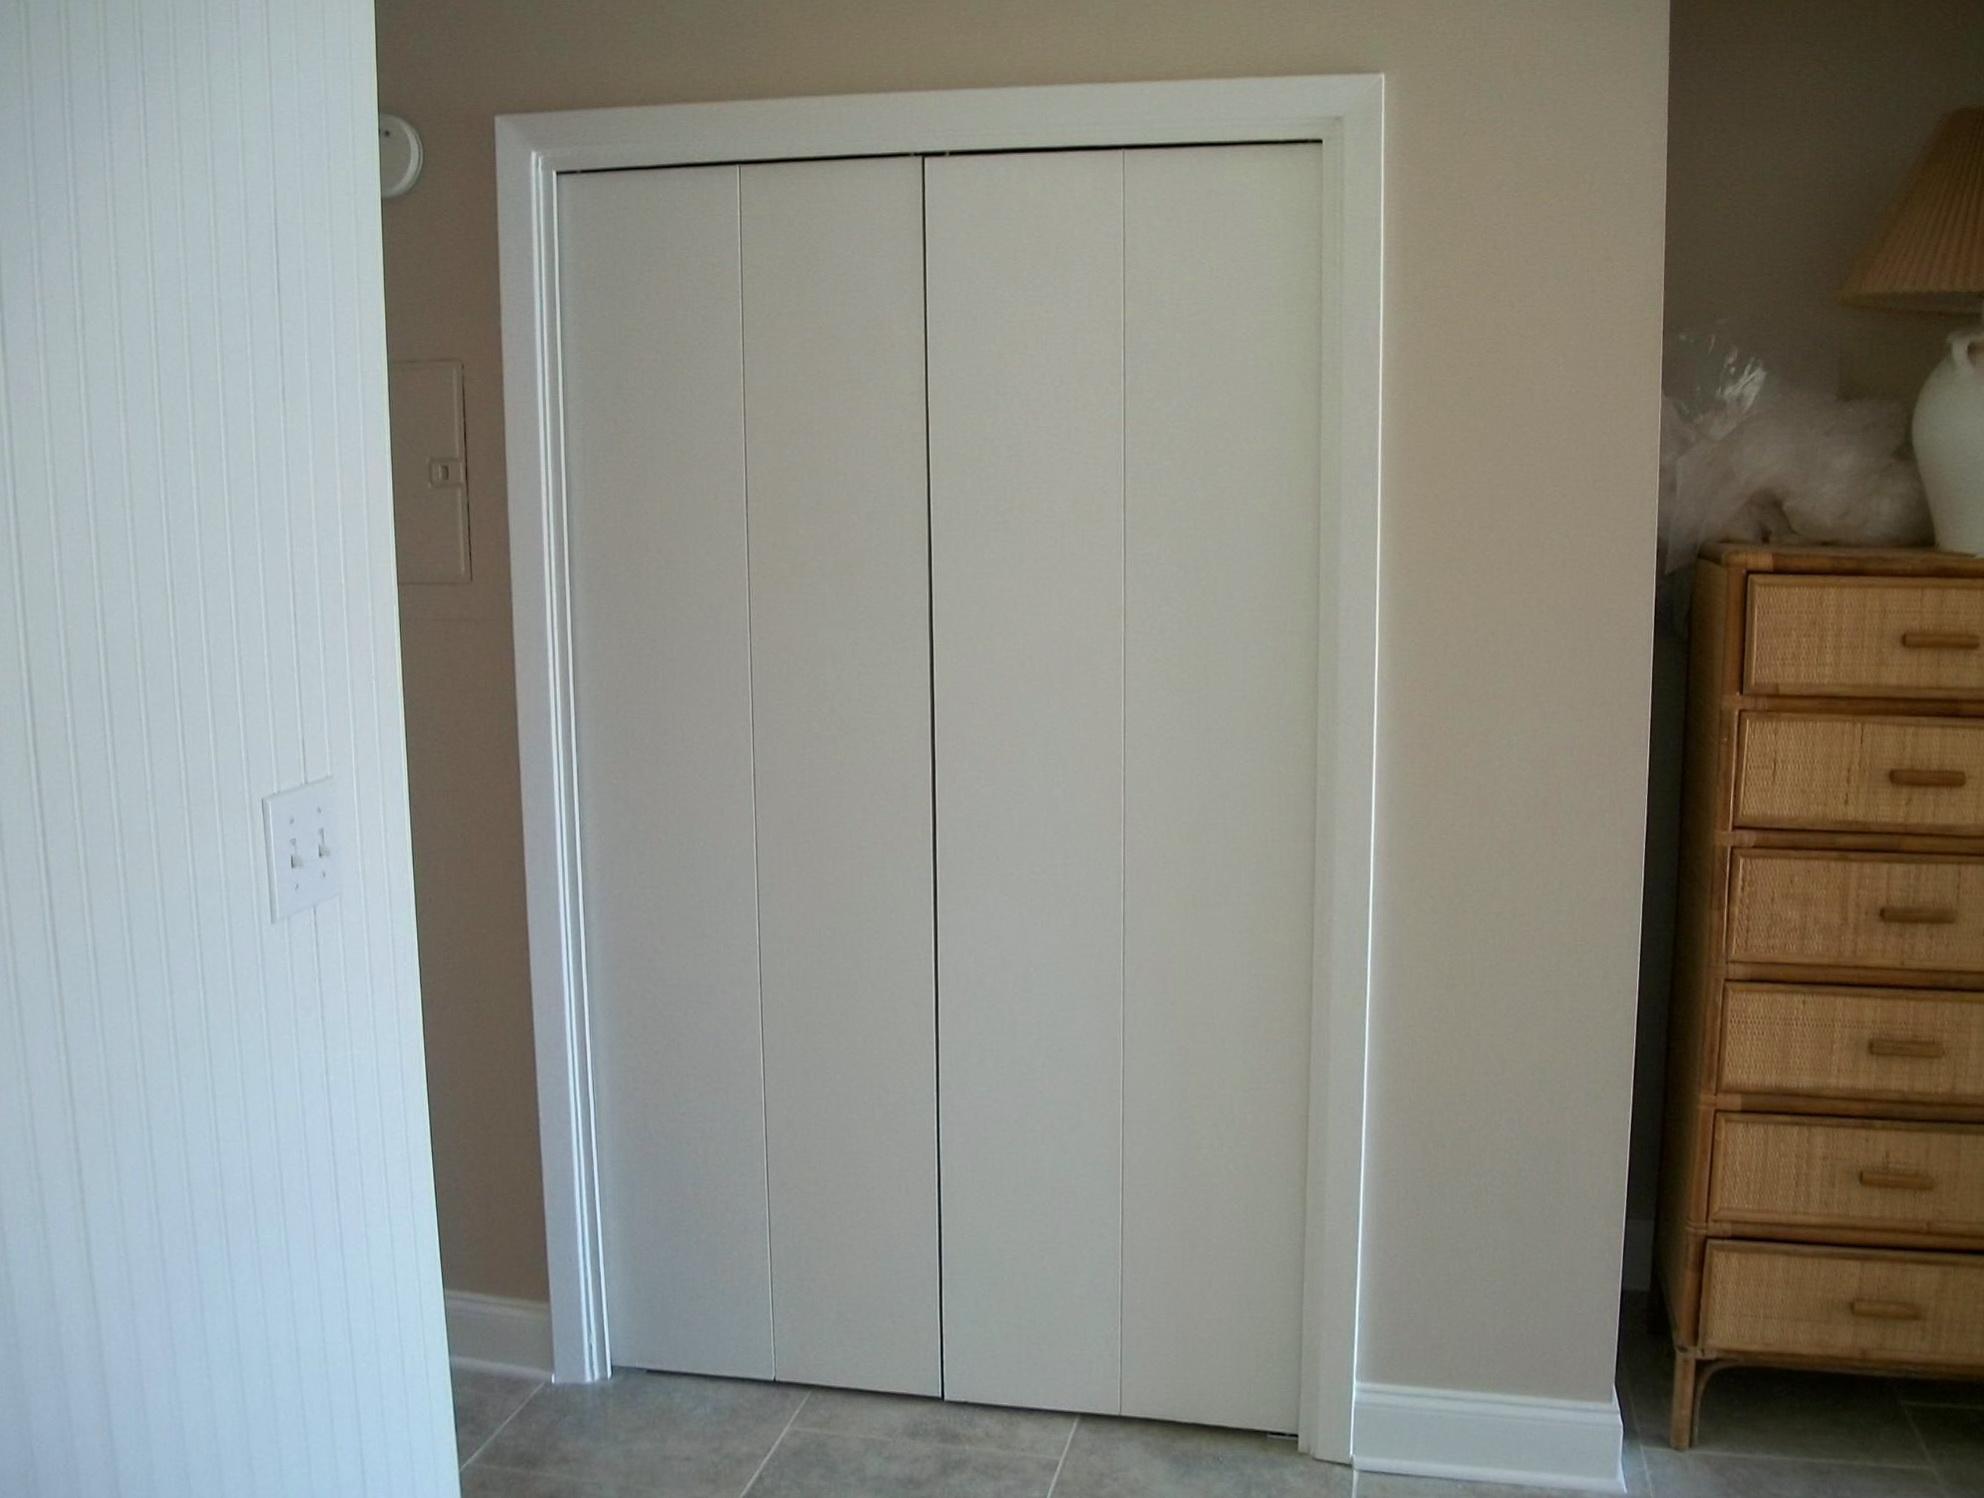 Installing Closet Doors On Tile Home Design Ideas